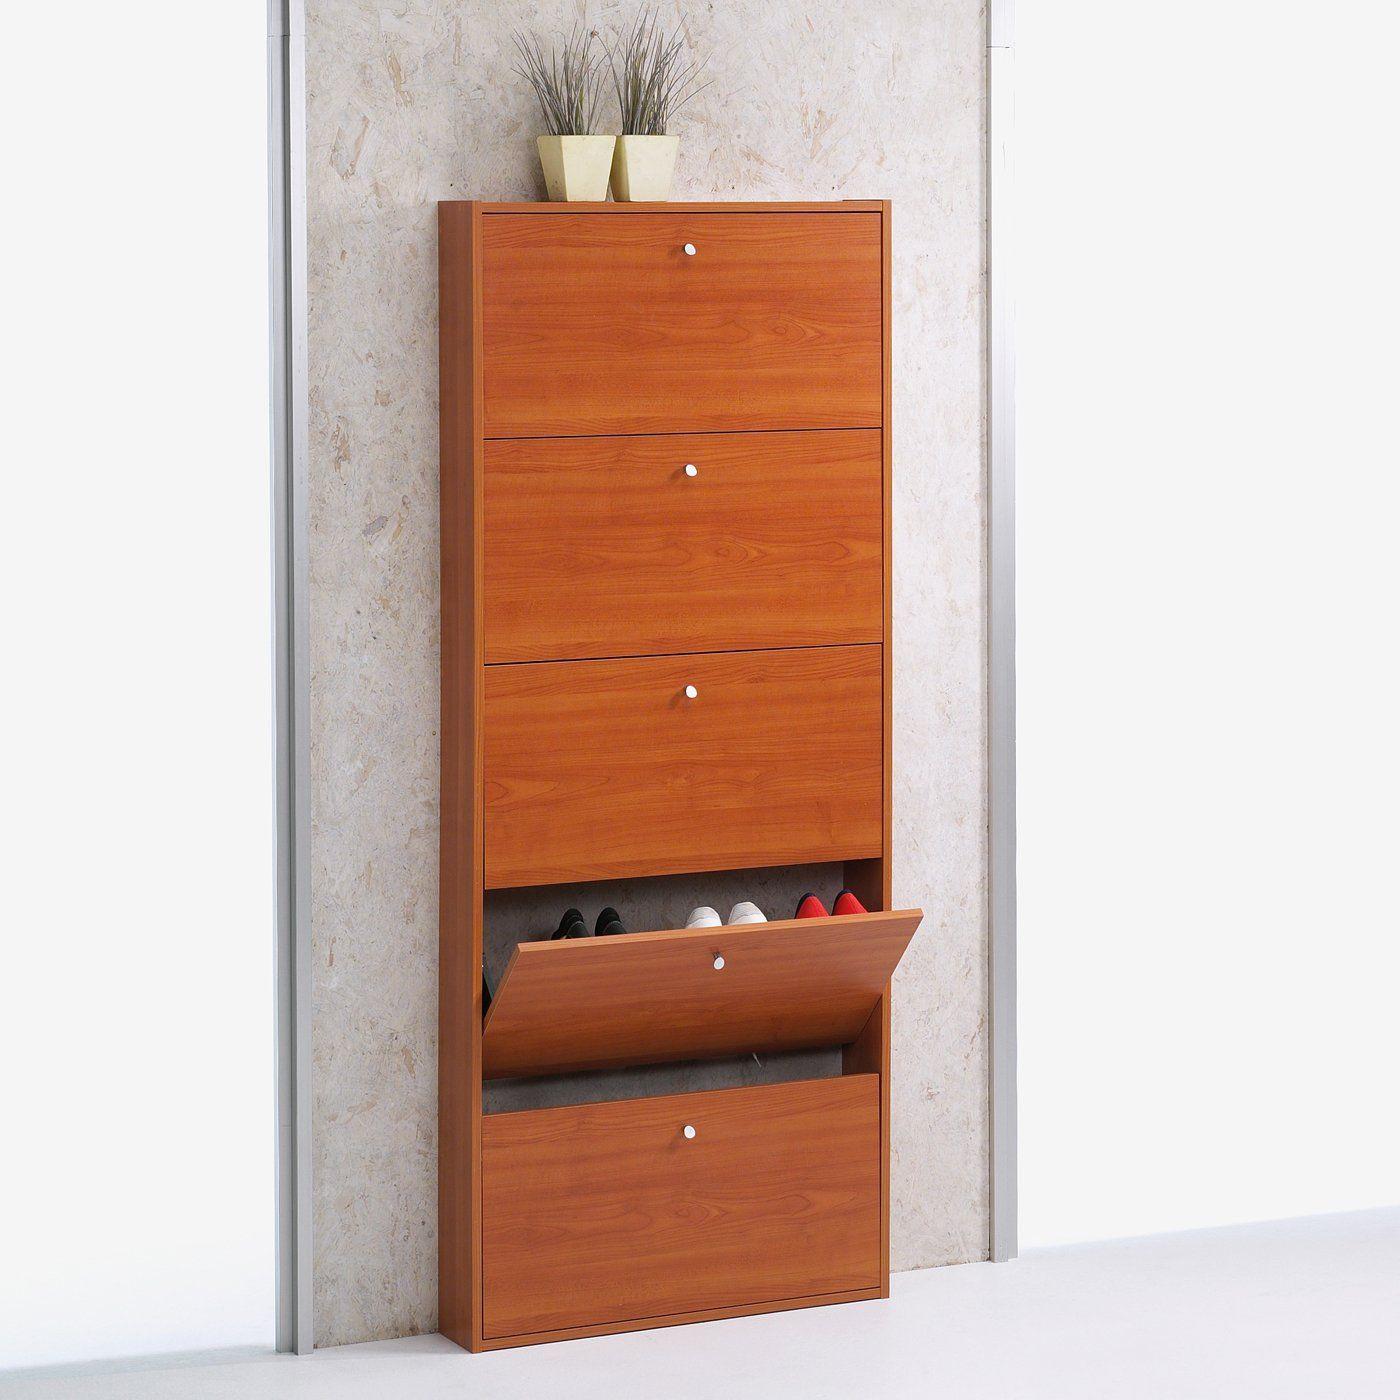 tvilum 70050 springfield shoe cabinet closet accessory on shoe rack wooden with door id=63204